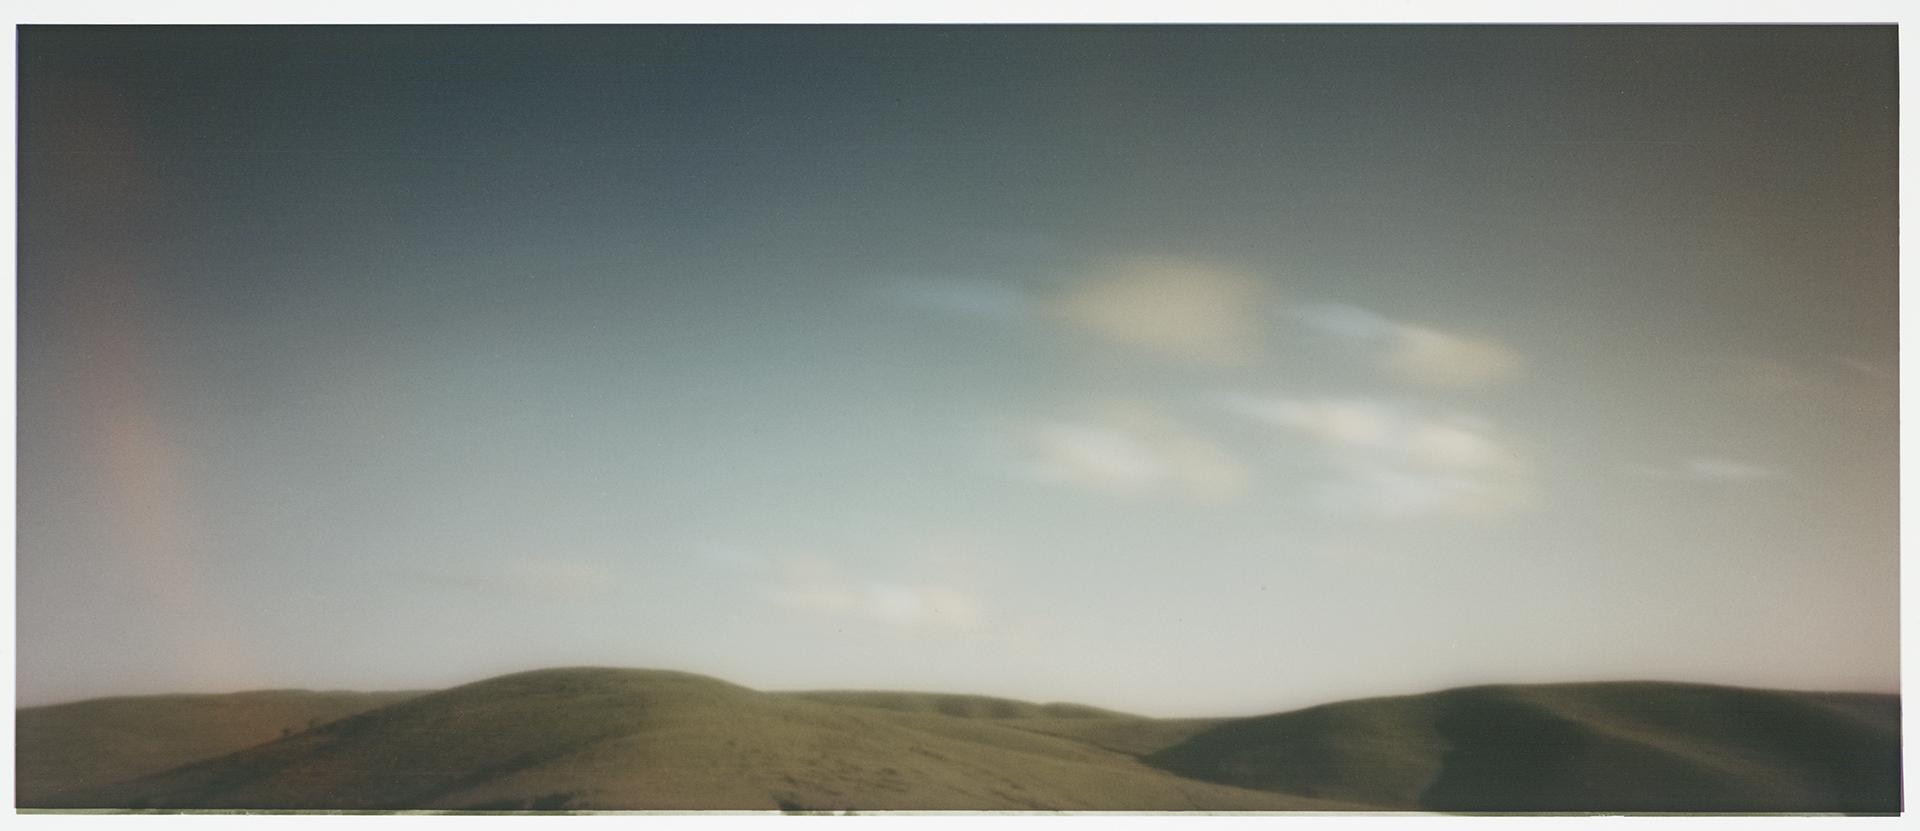 E.T. 6.10-6.35. East Tibet, 2016